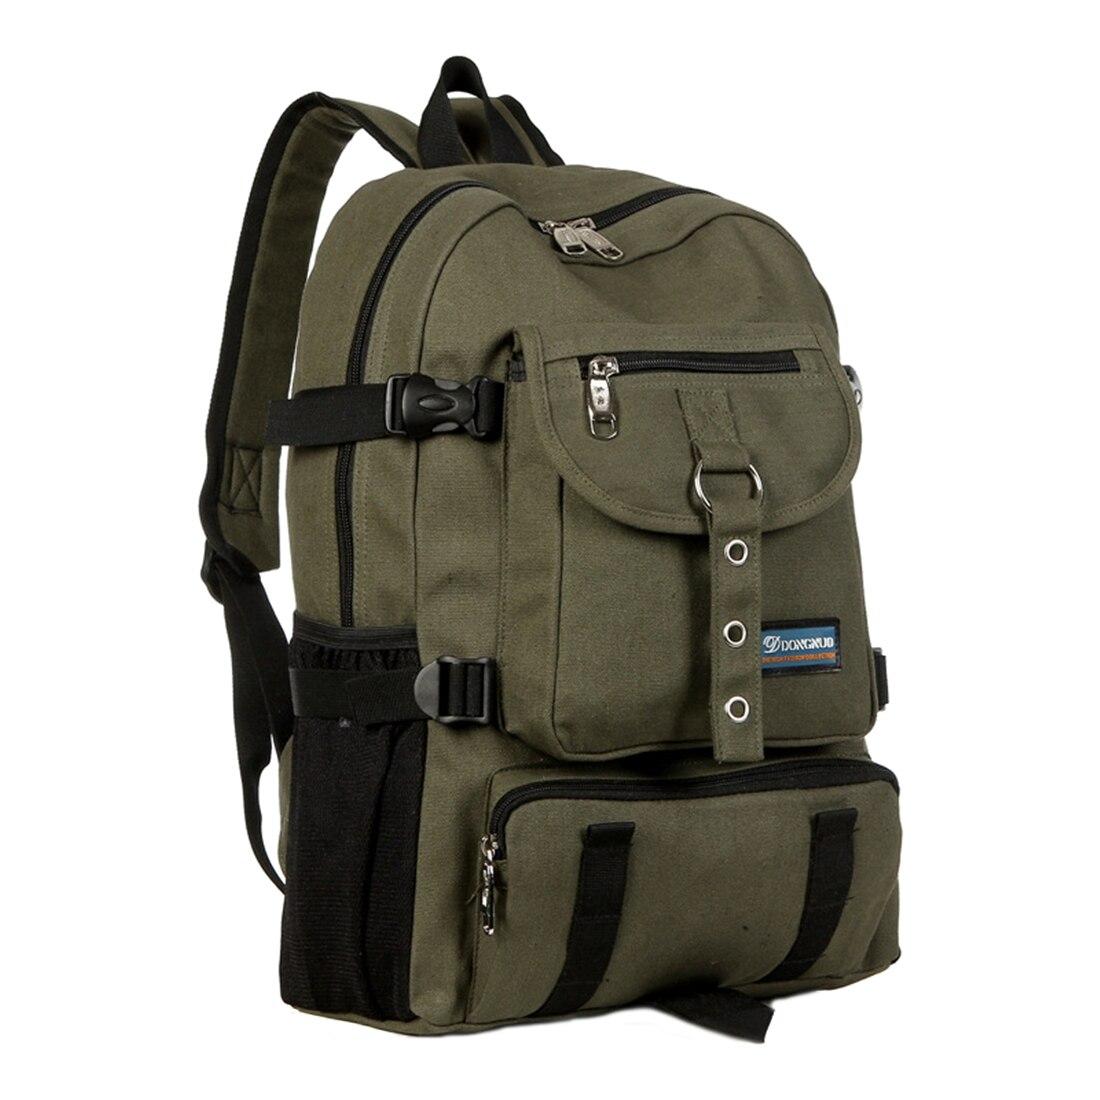 DONGNUO New Fashion arcuate shoulder strap zipper casual bag backpack school bag canvas bag for men school portable hand strap zipper closure files document bag black